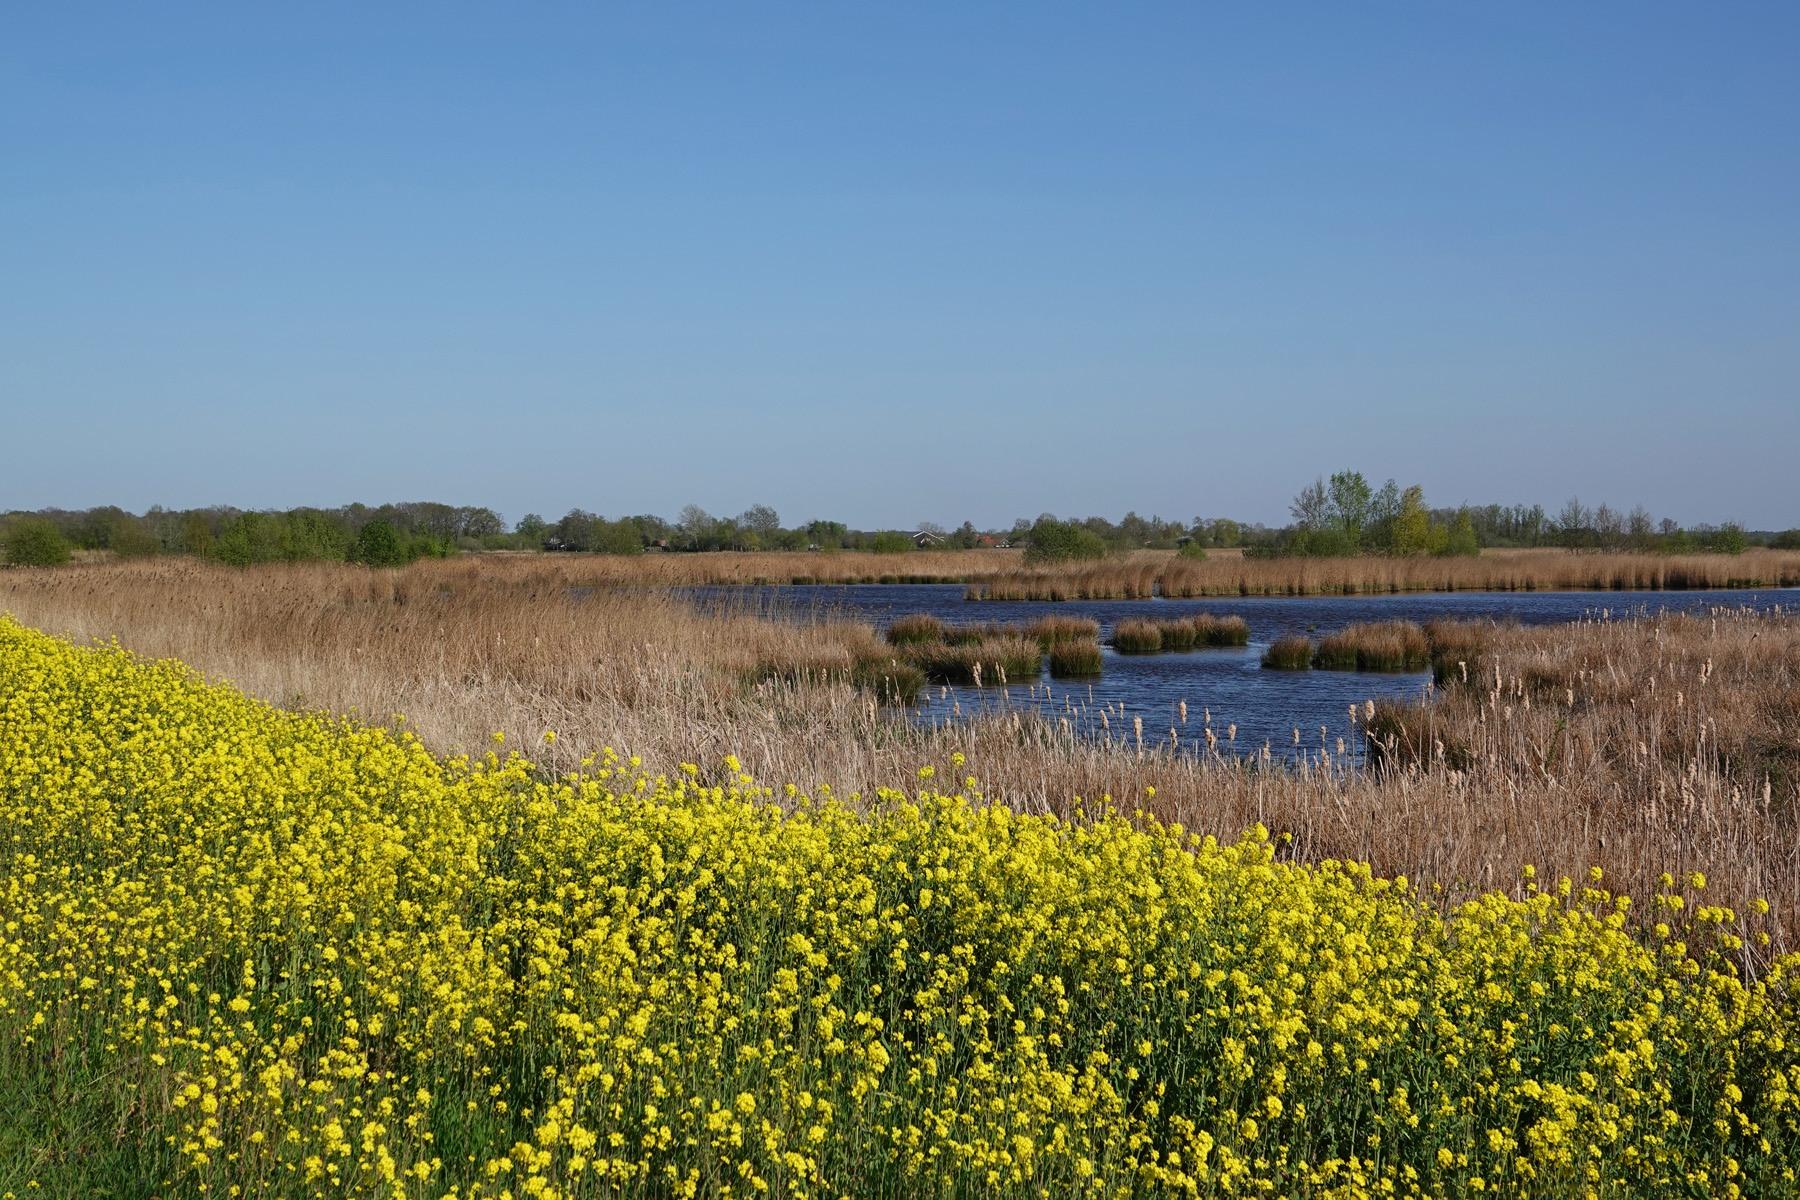 Bloeiend raapzaad langs Langmameer (Onlanden)